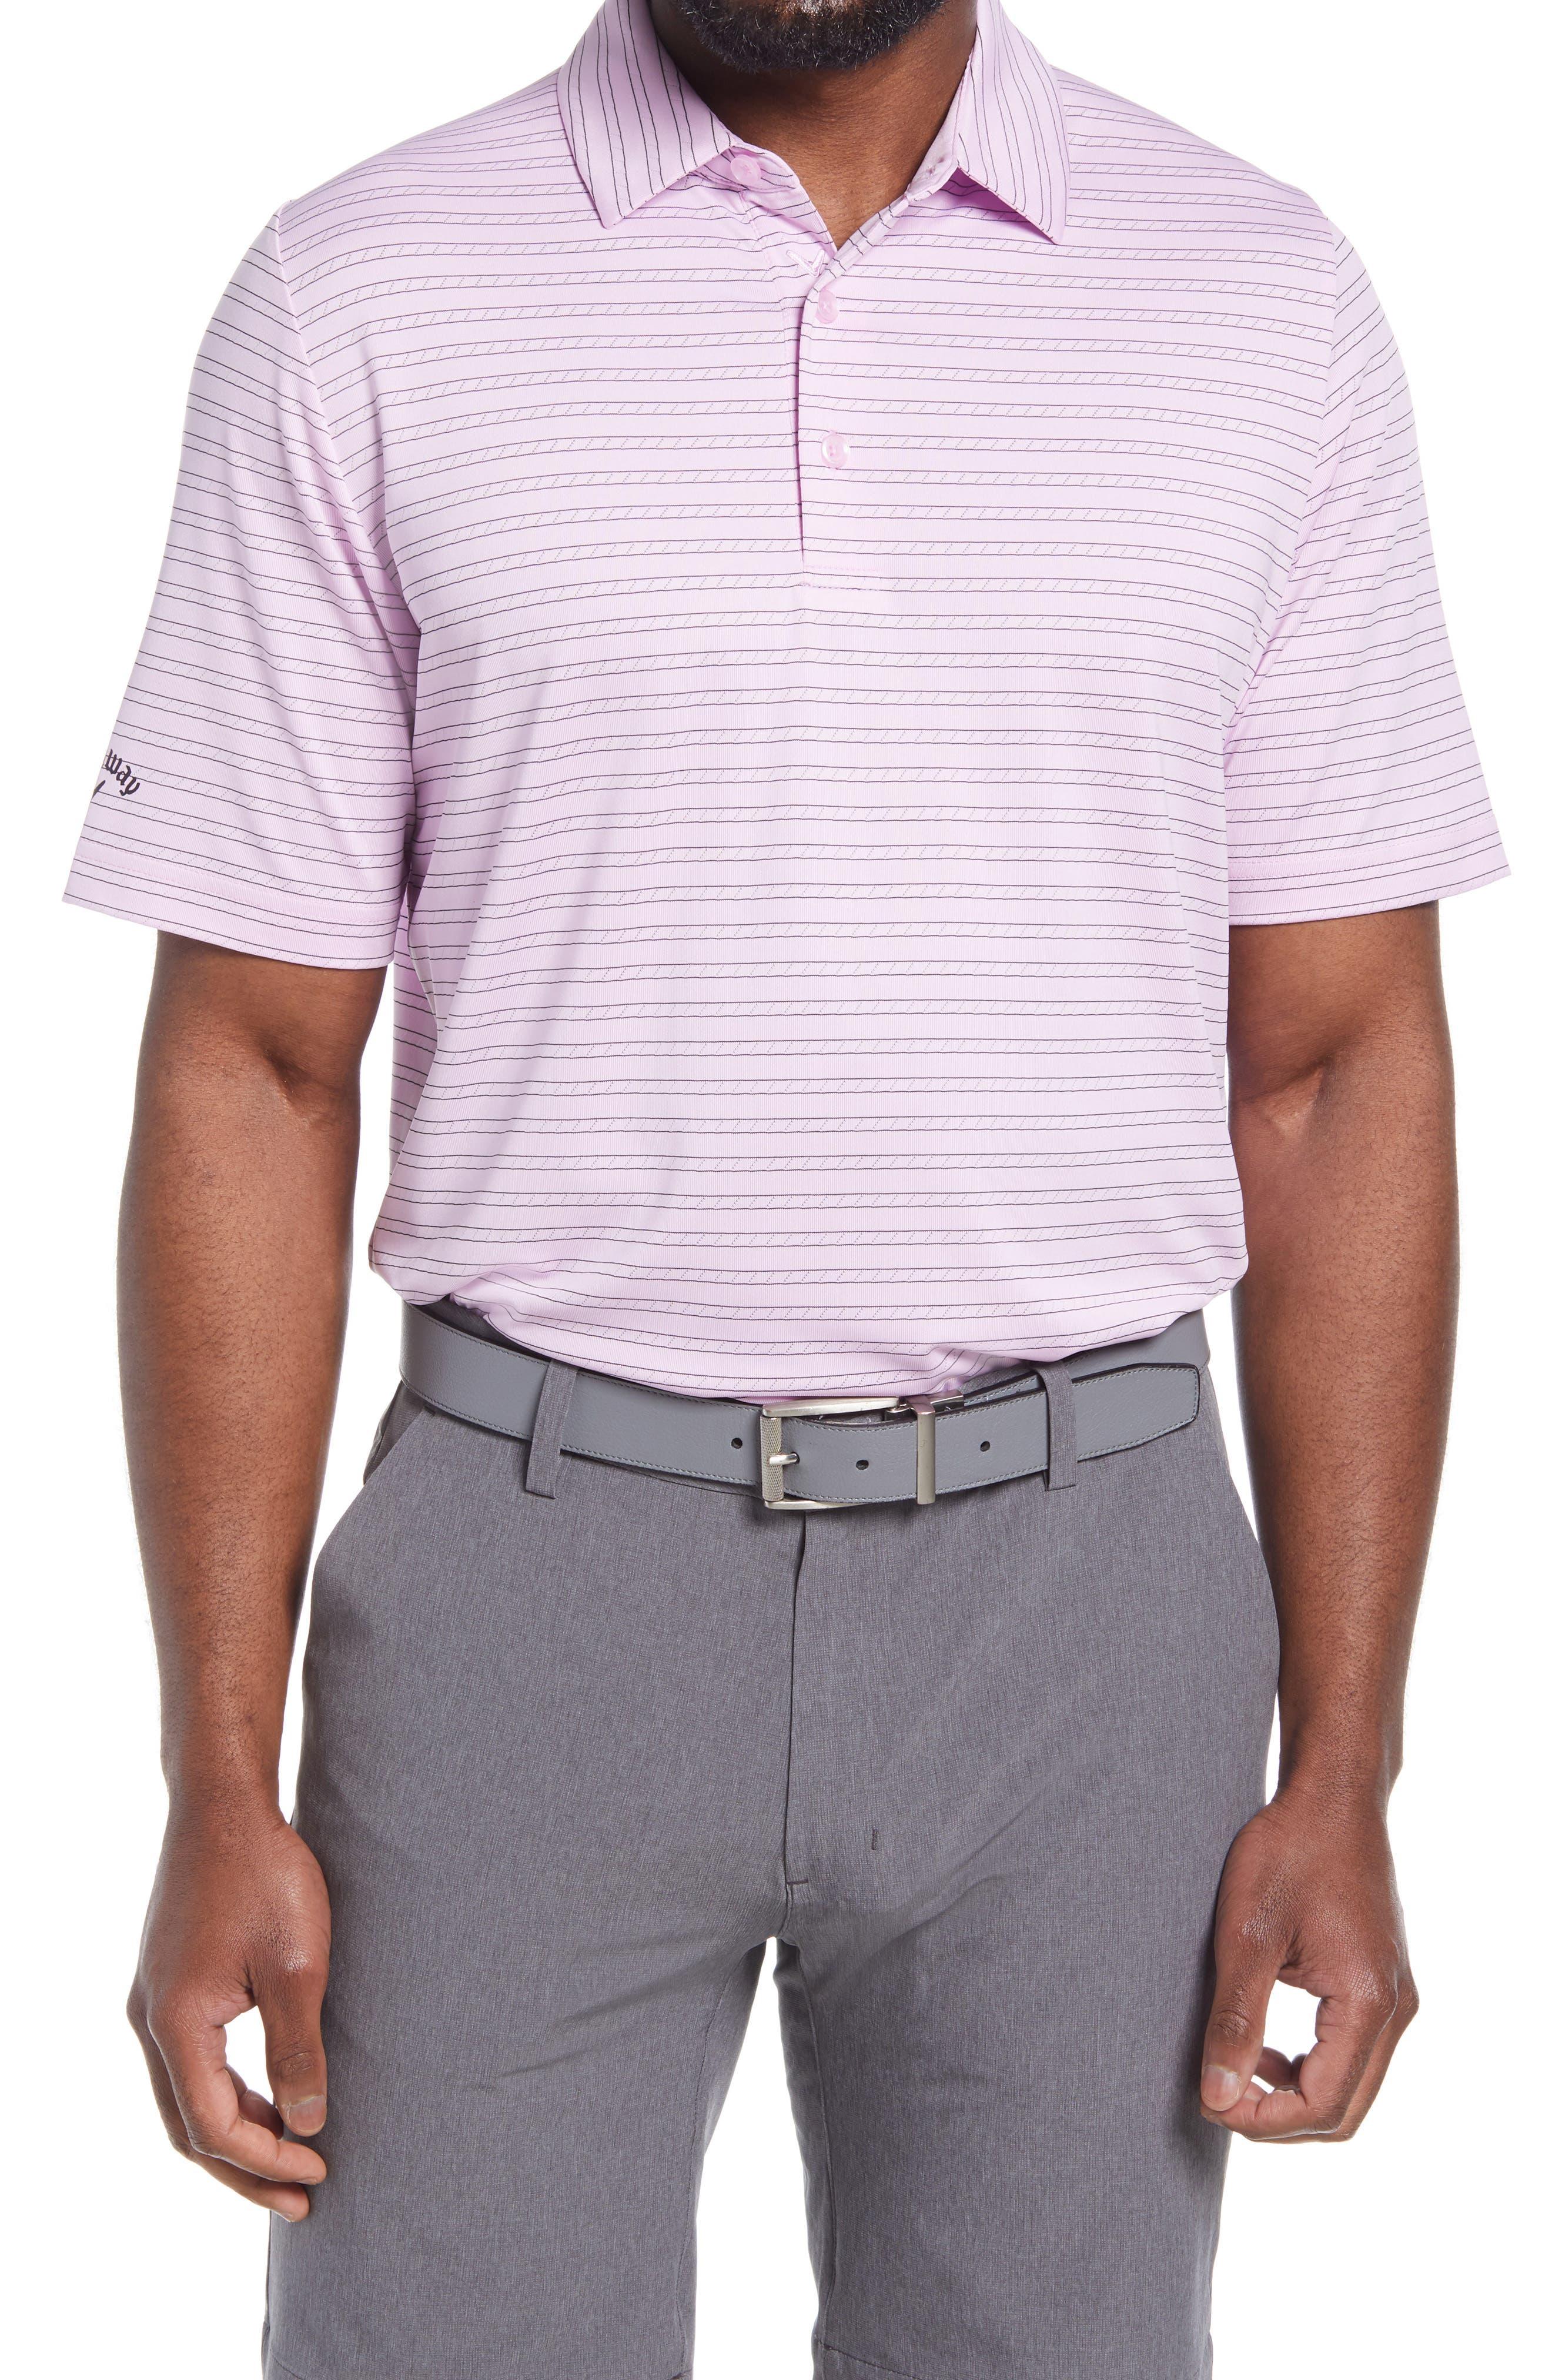 Men's Callaway Golf Swing Tech(TM) Ventilated Stripe Performance Golf Polo